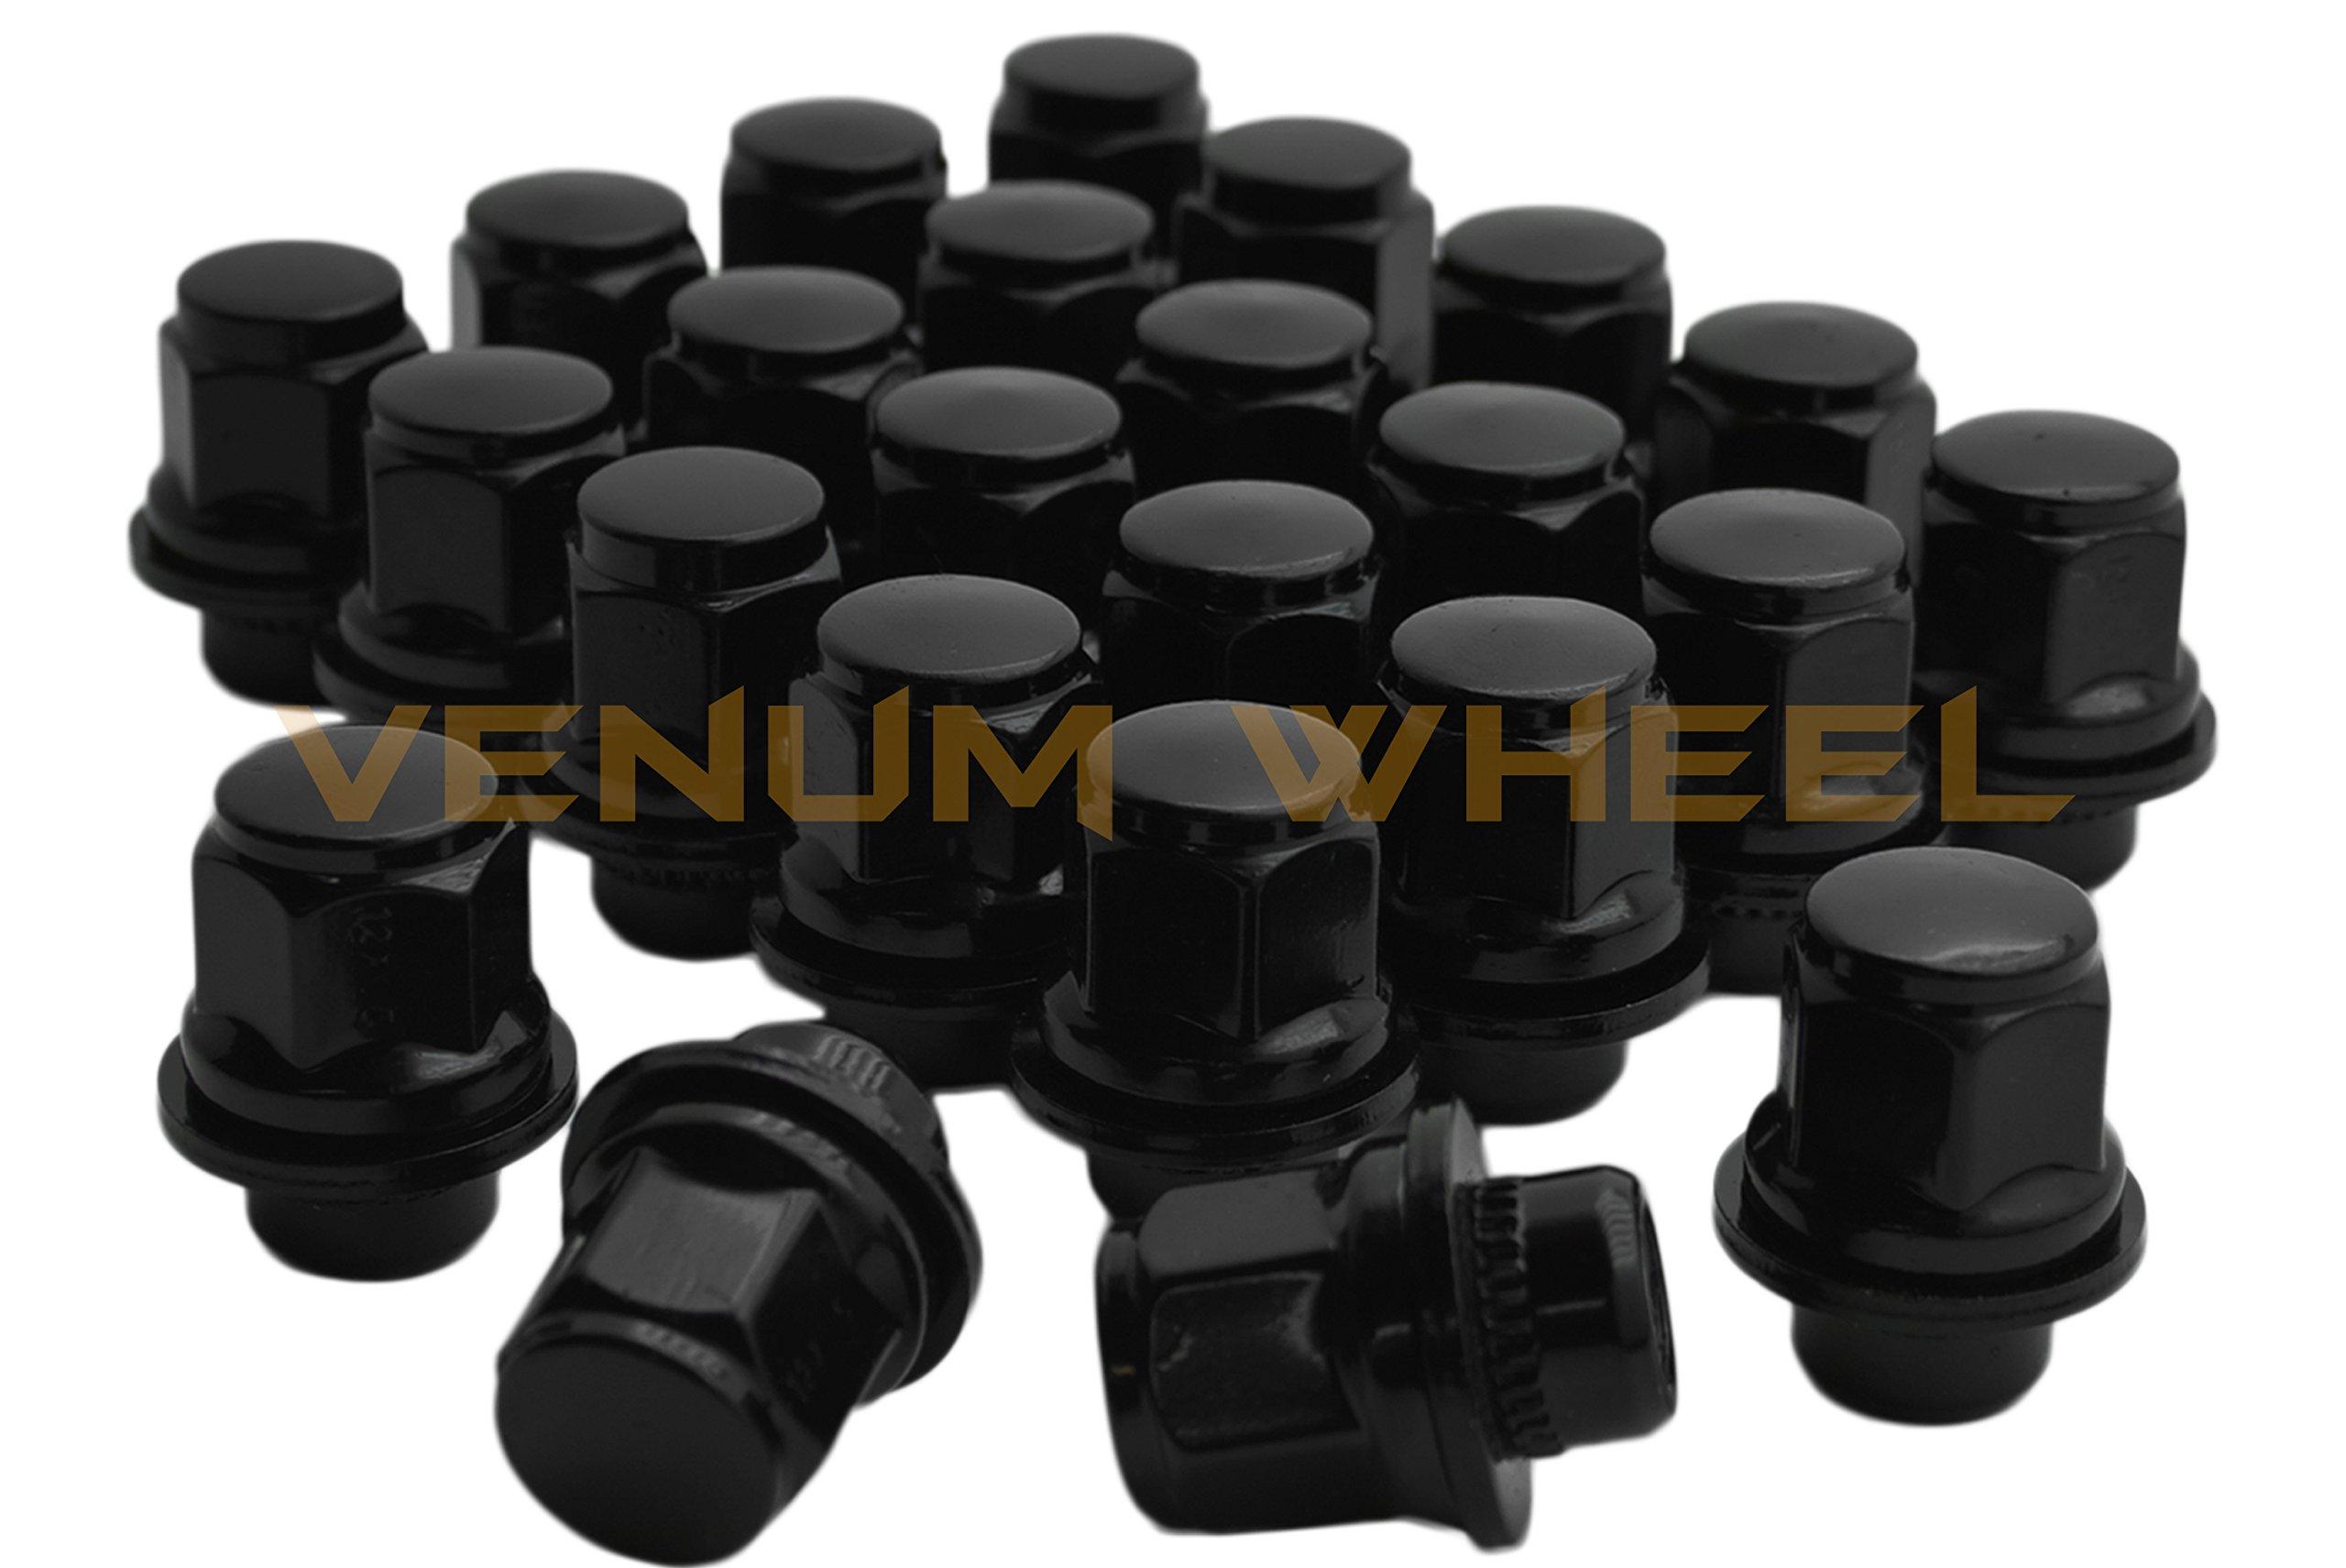 24 Pc Black Toyota Tacoma Tundra Fj Cruiser Oem Mag Seat Lug Nuts 12x1.5 1.45'' Tall 6 Lug by Venum wheel accessories (Image #1)